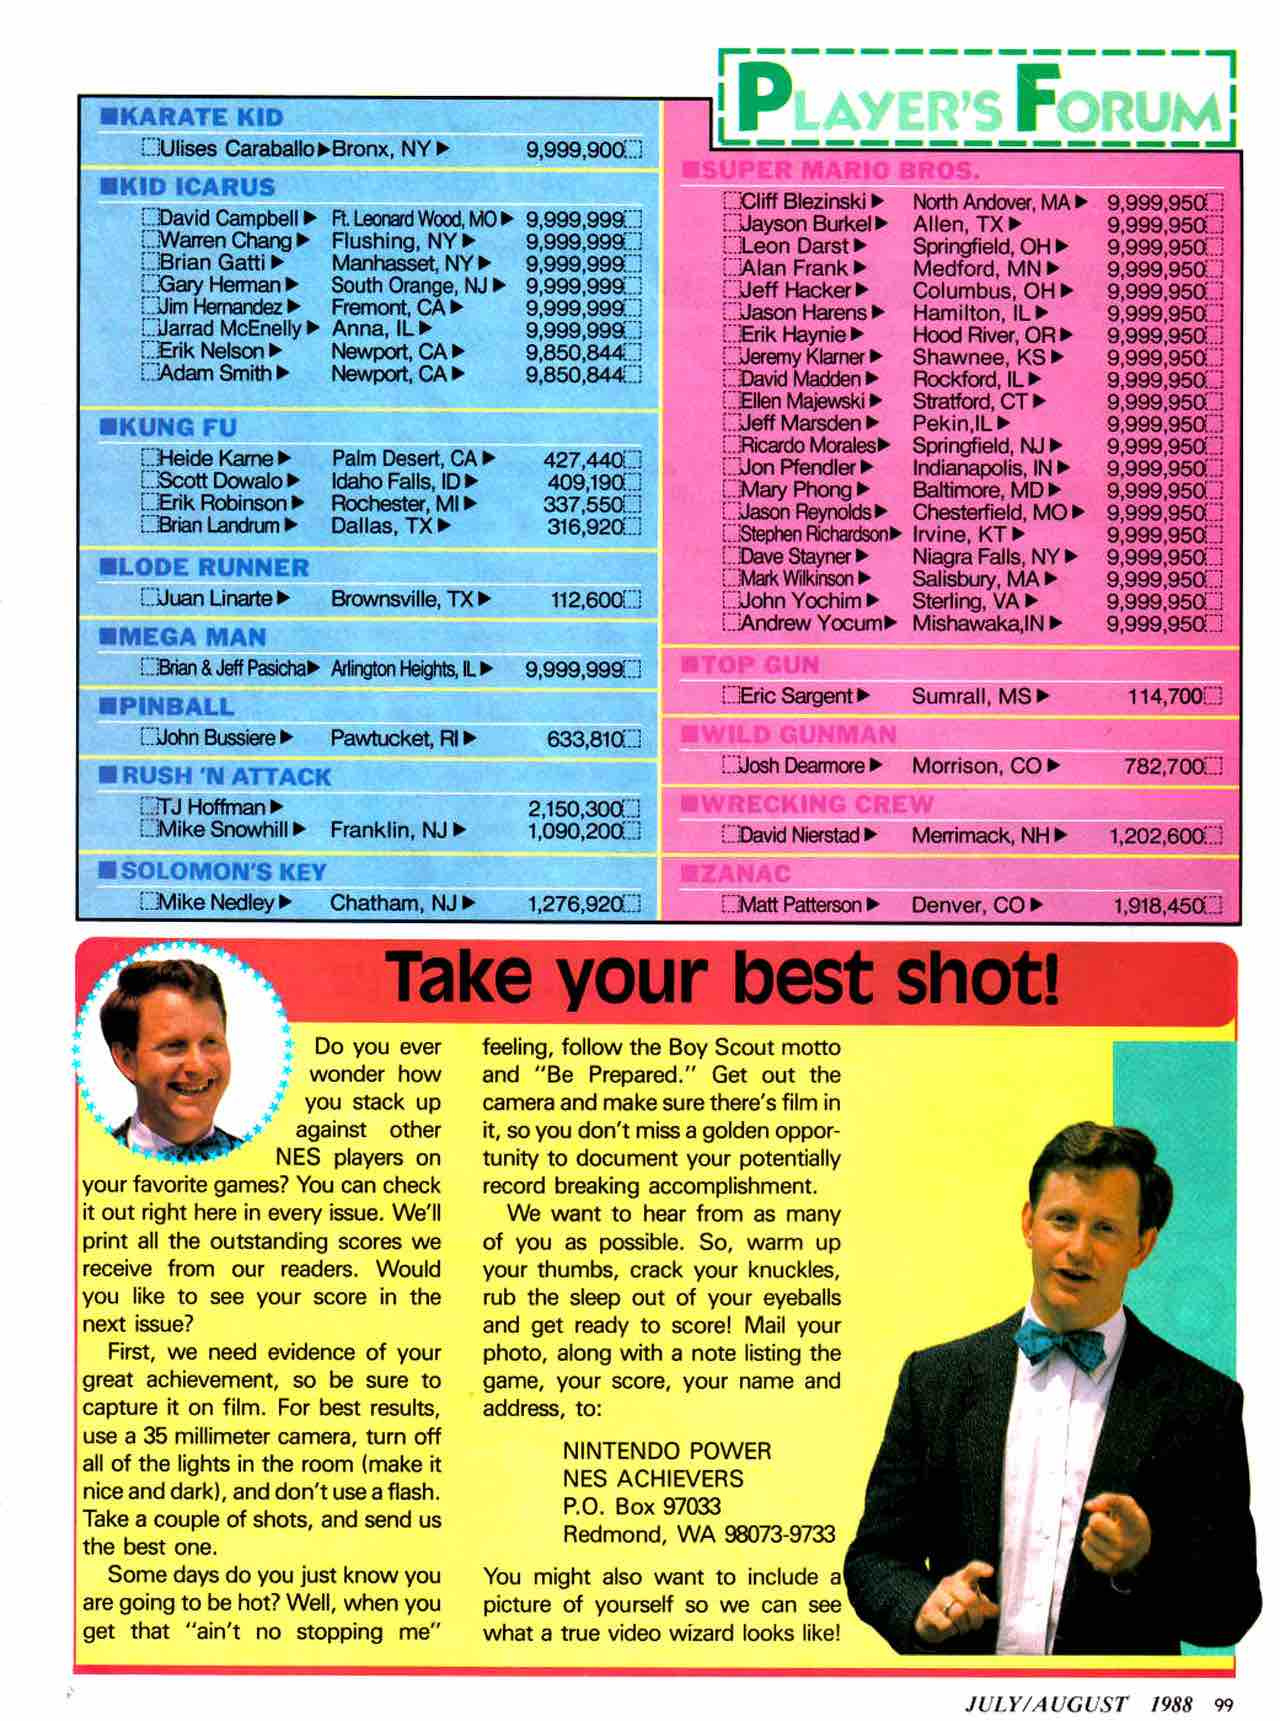 Nintendo Power | July August 1988 - pg 99